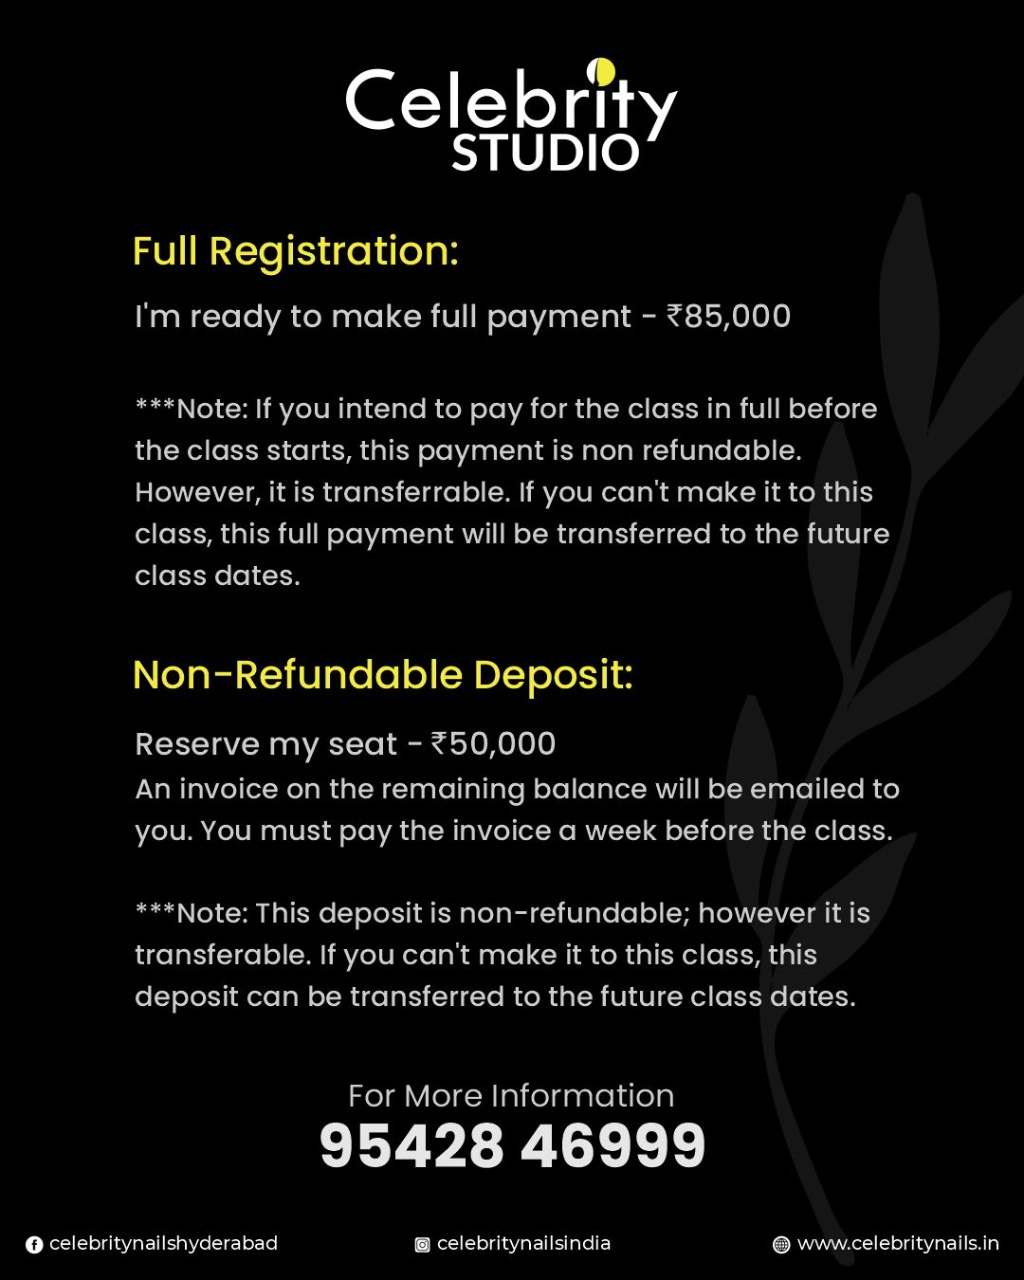 Celebrity Studio